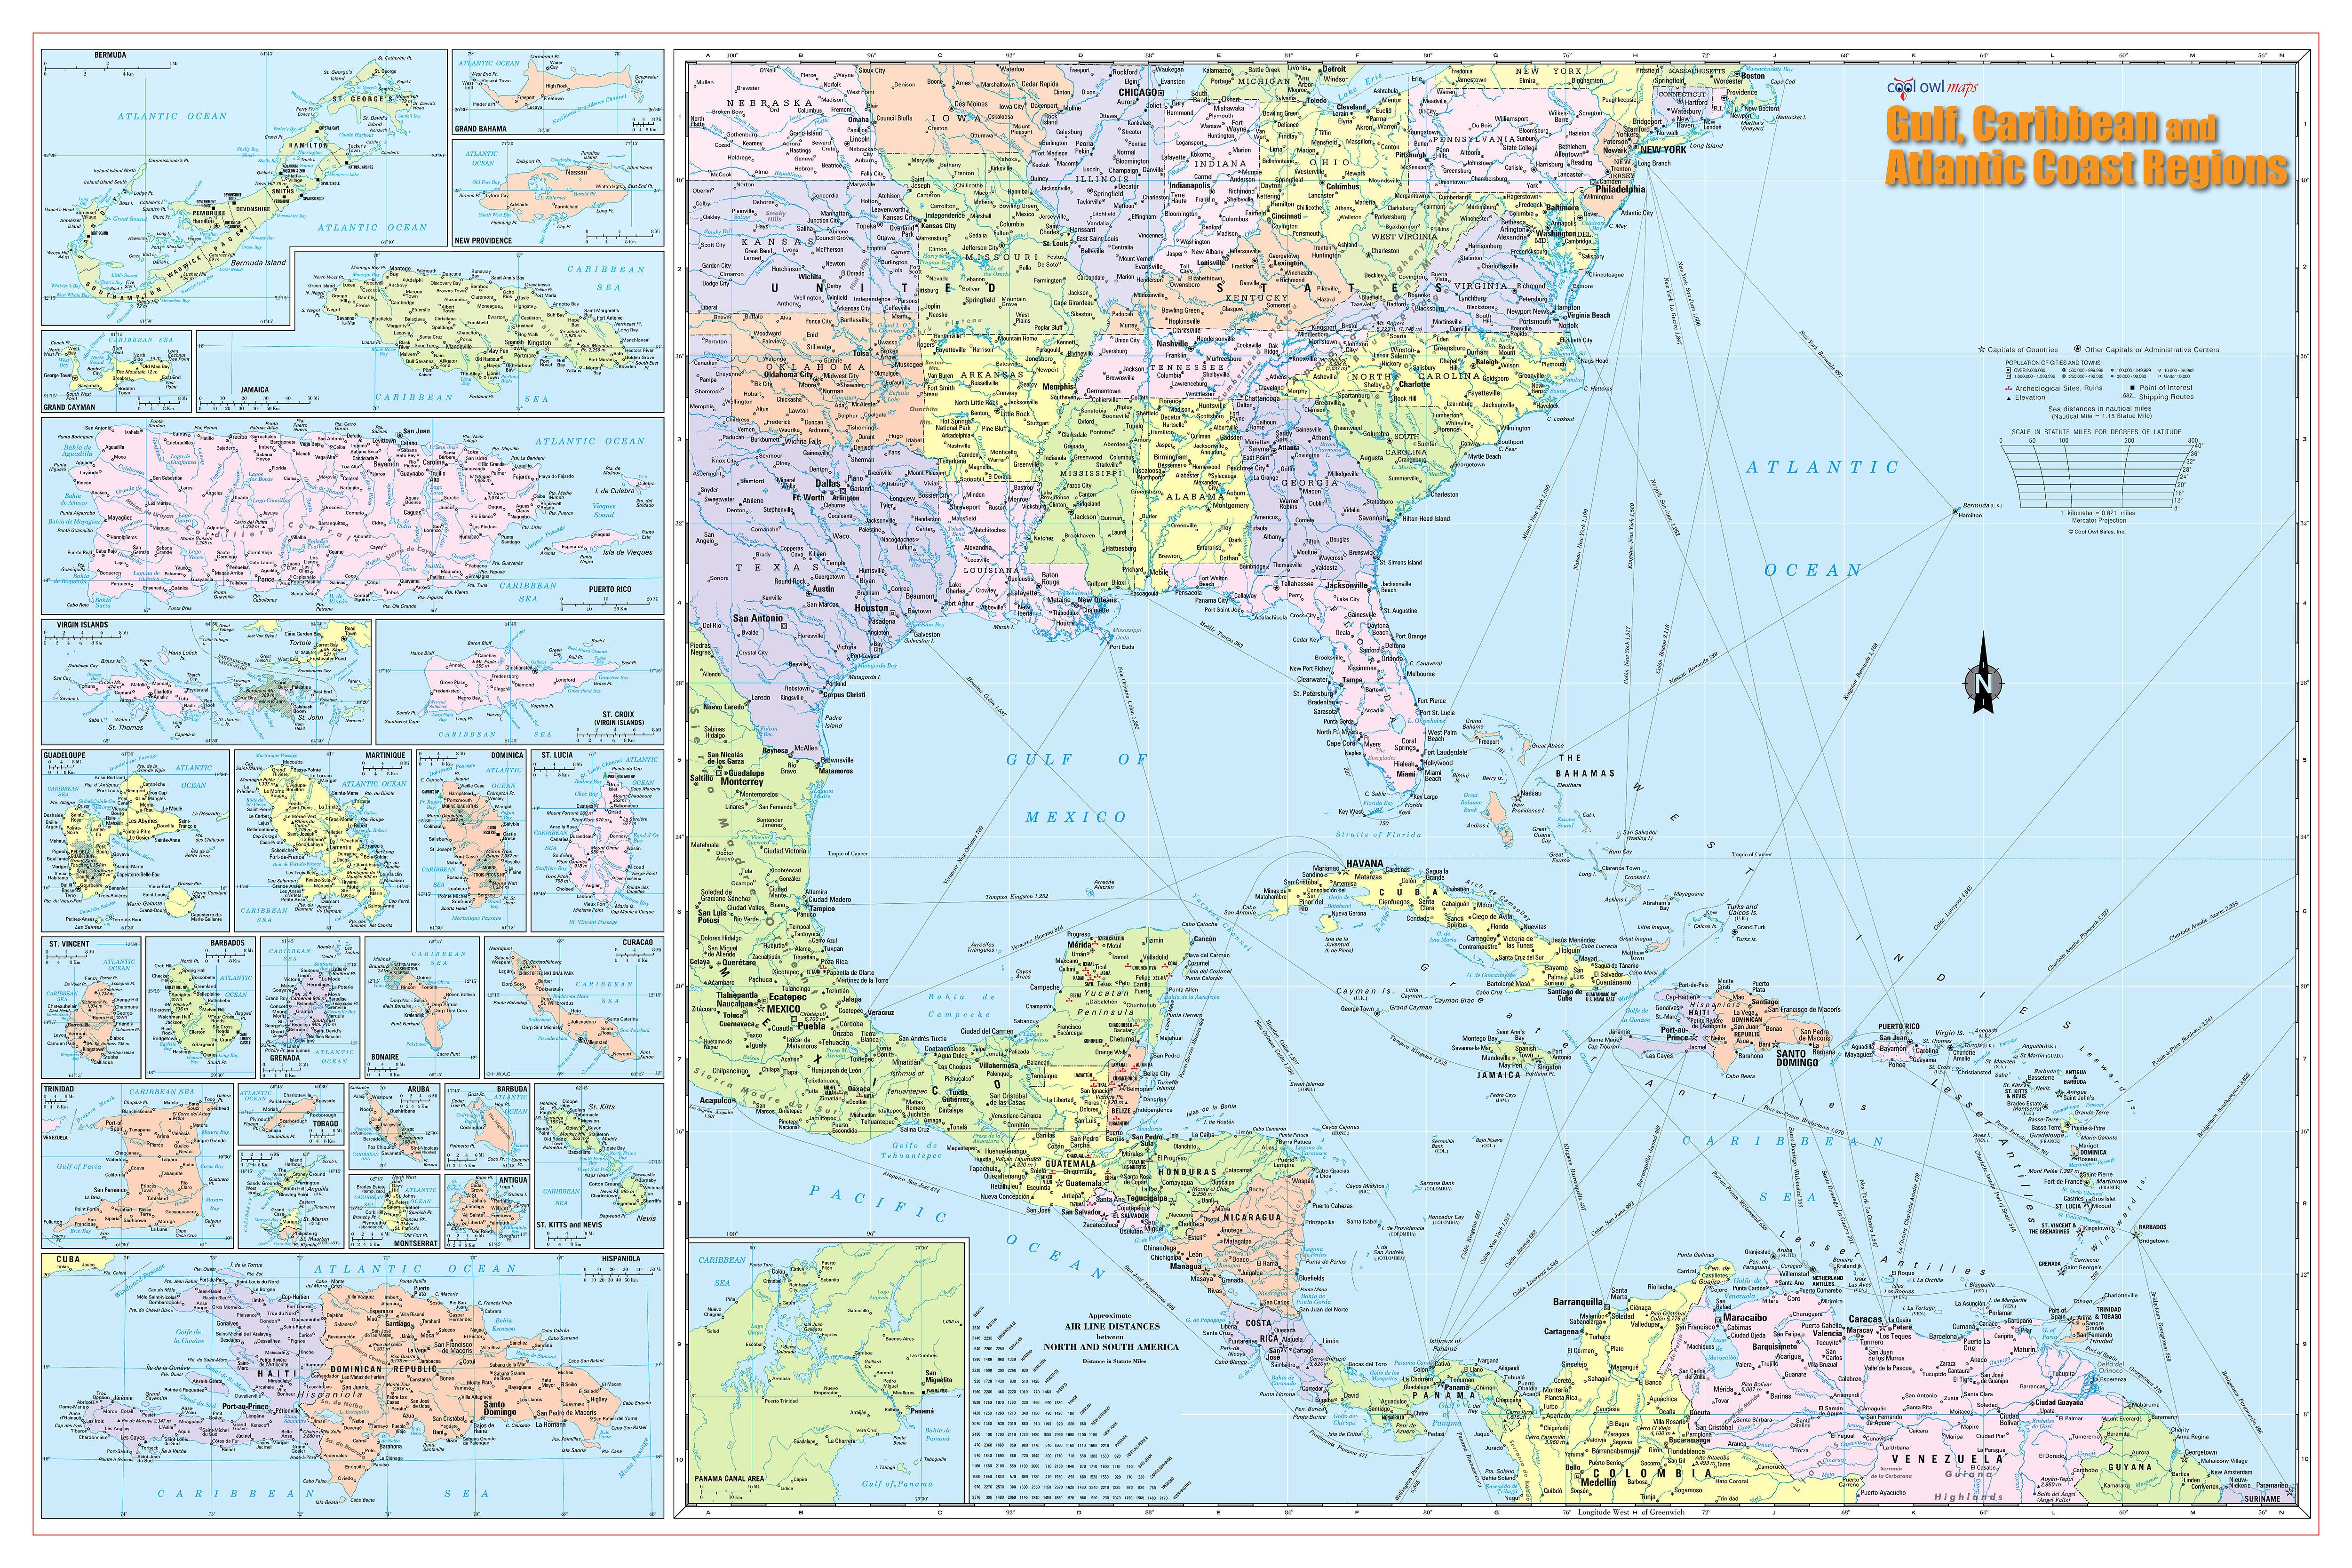 Wall Maps Posters Cool Owl Maps Gulf Caribbean Atlantic - Carribean island map